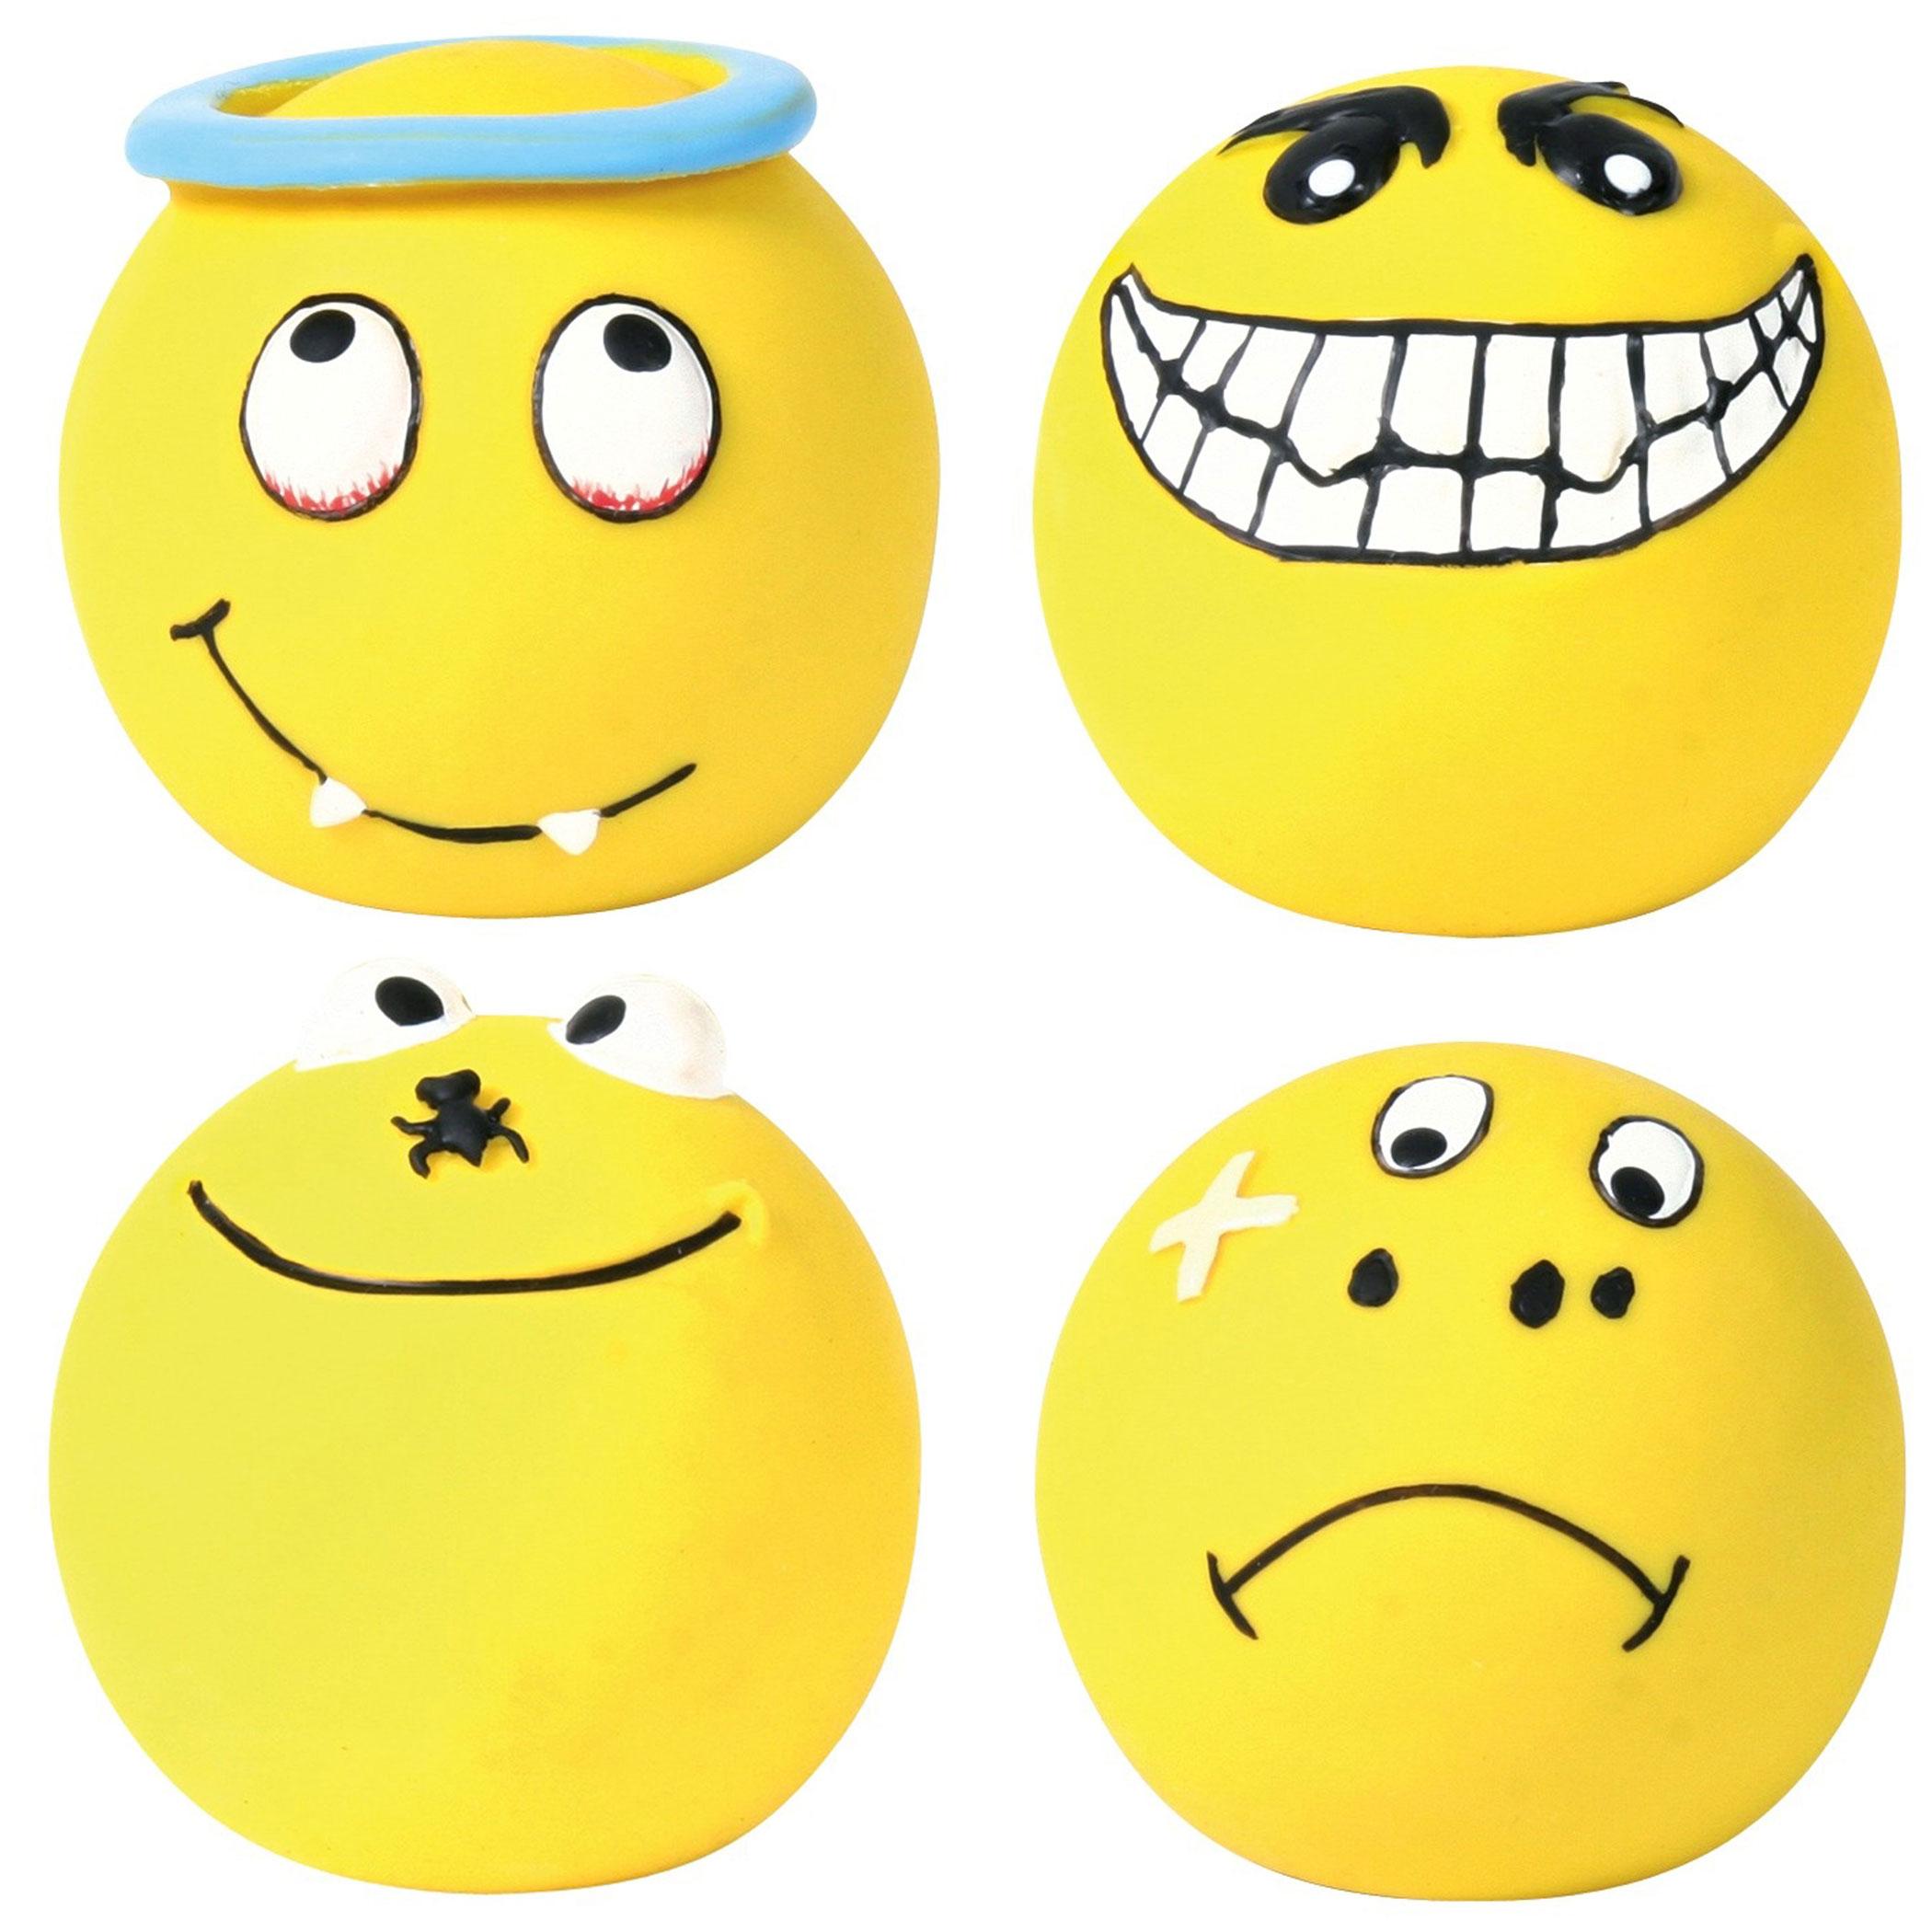 Hundespielzeug Ball Smiley Latex TRIXIE Ø 6 cm Bild 2